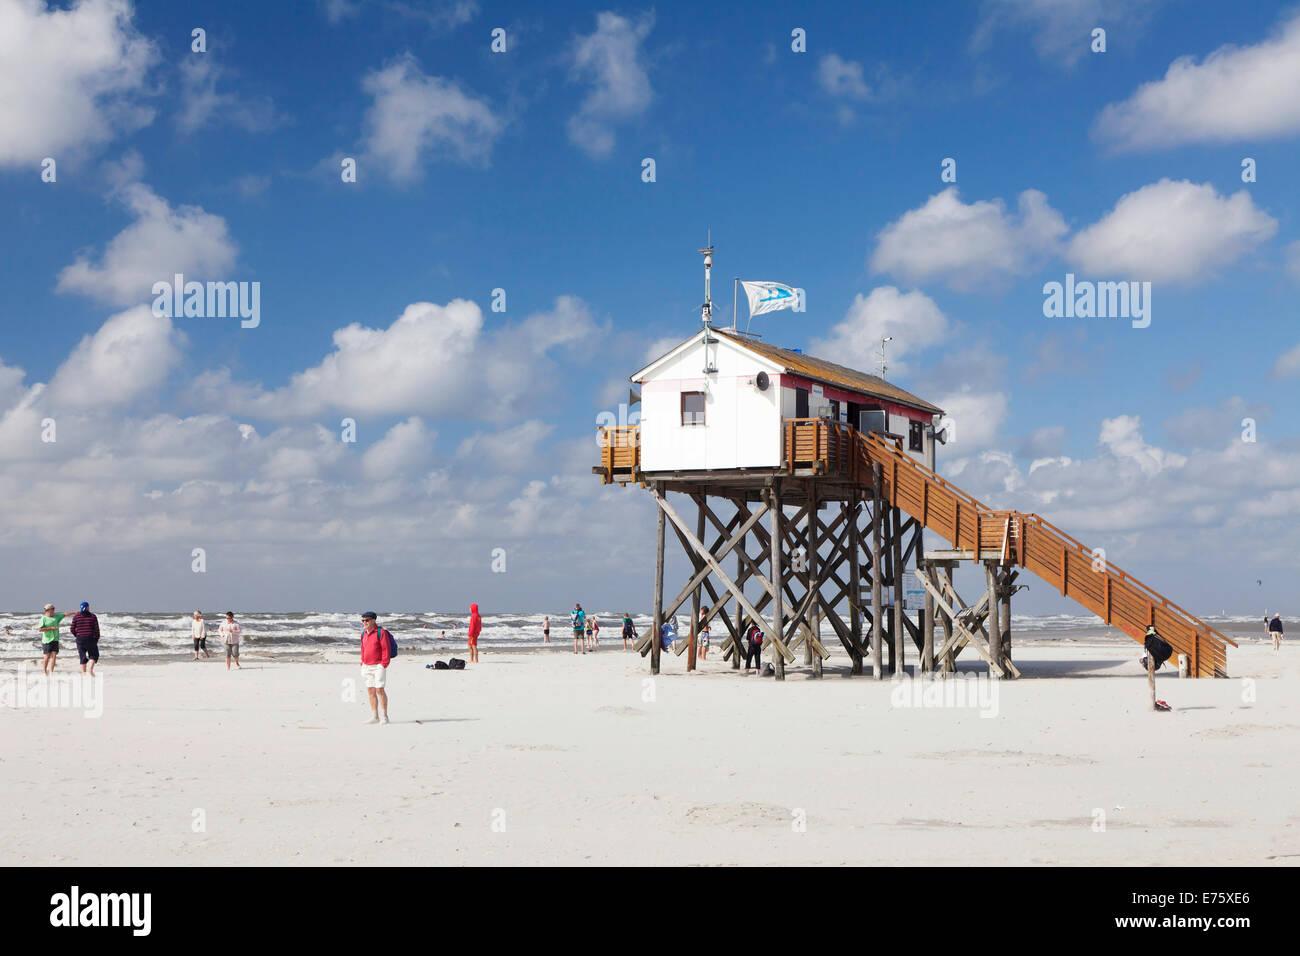 St Peter Ording Beach House